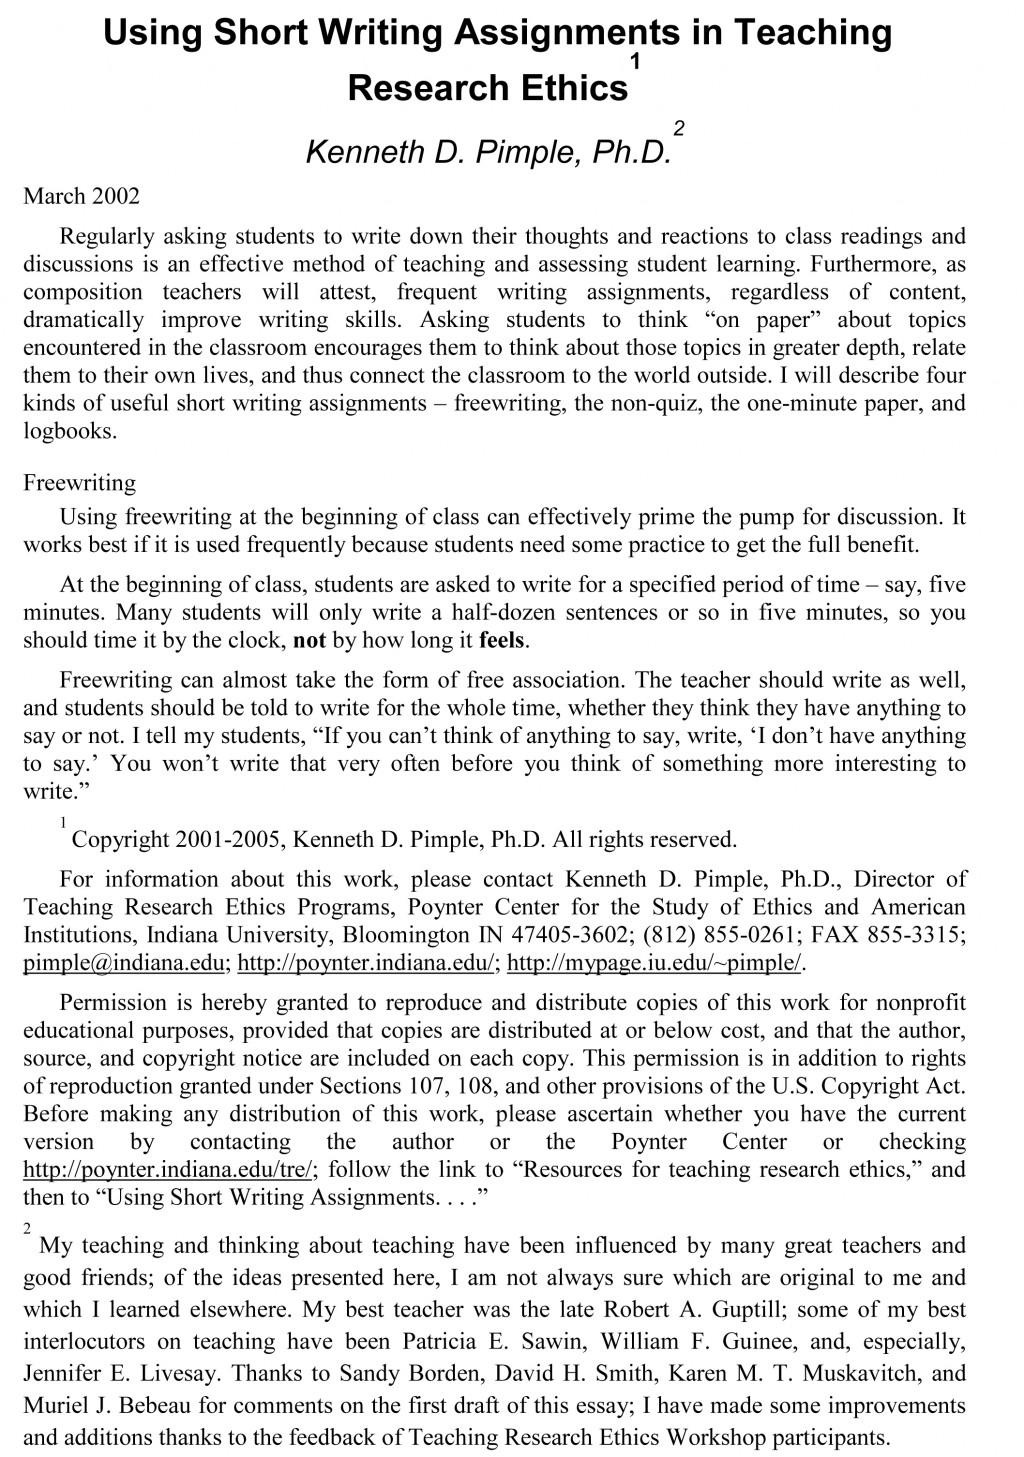 002 Sample Teaching College Essay Writing Imposing Service Reddit Custom Application Help Large